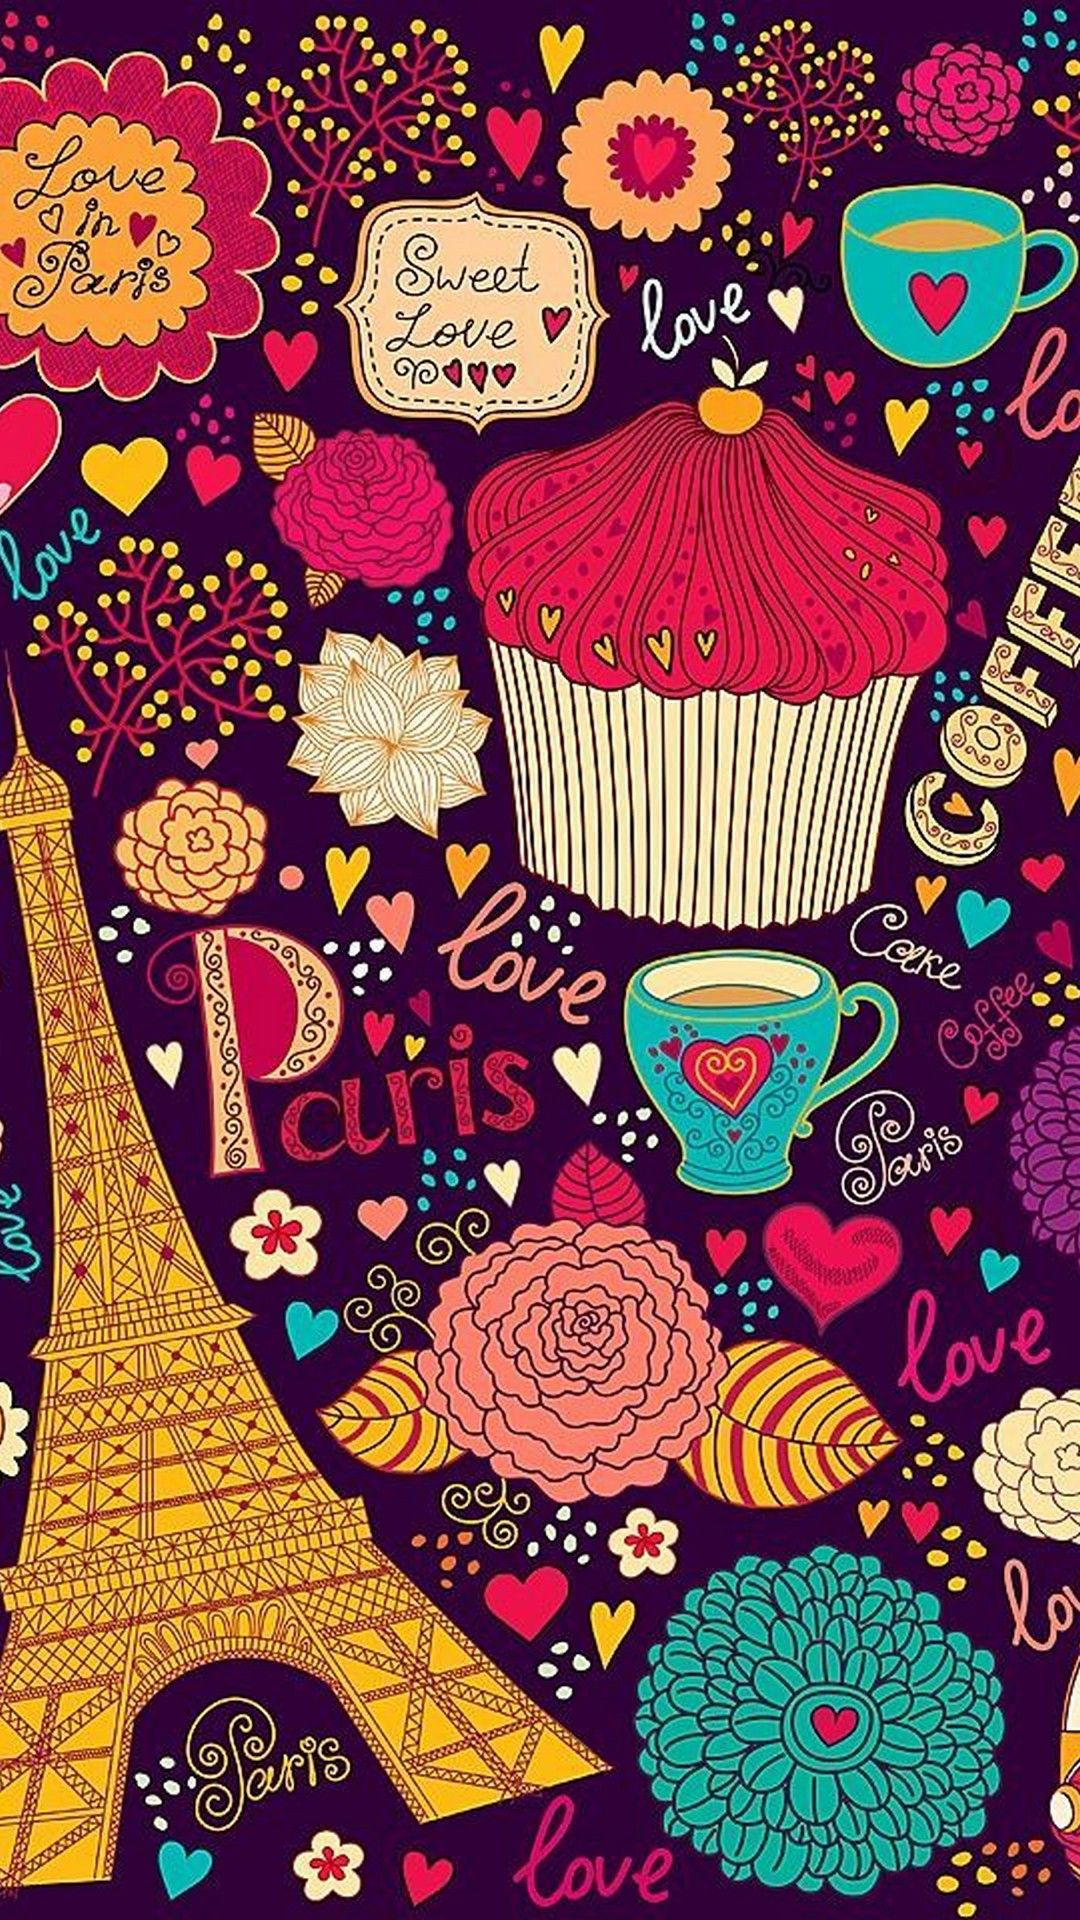 Paris Wallpaper Cute Girly Iphone Paris Wallpaper Iphone